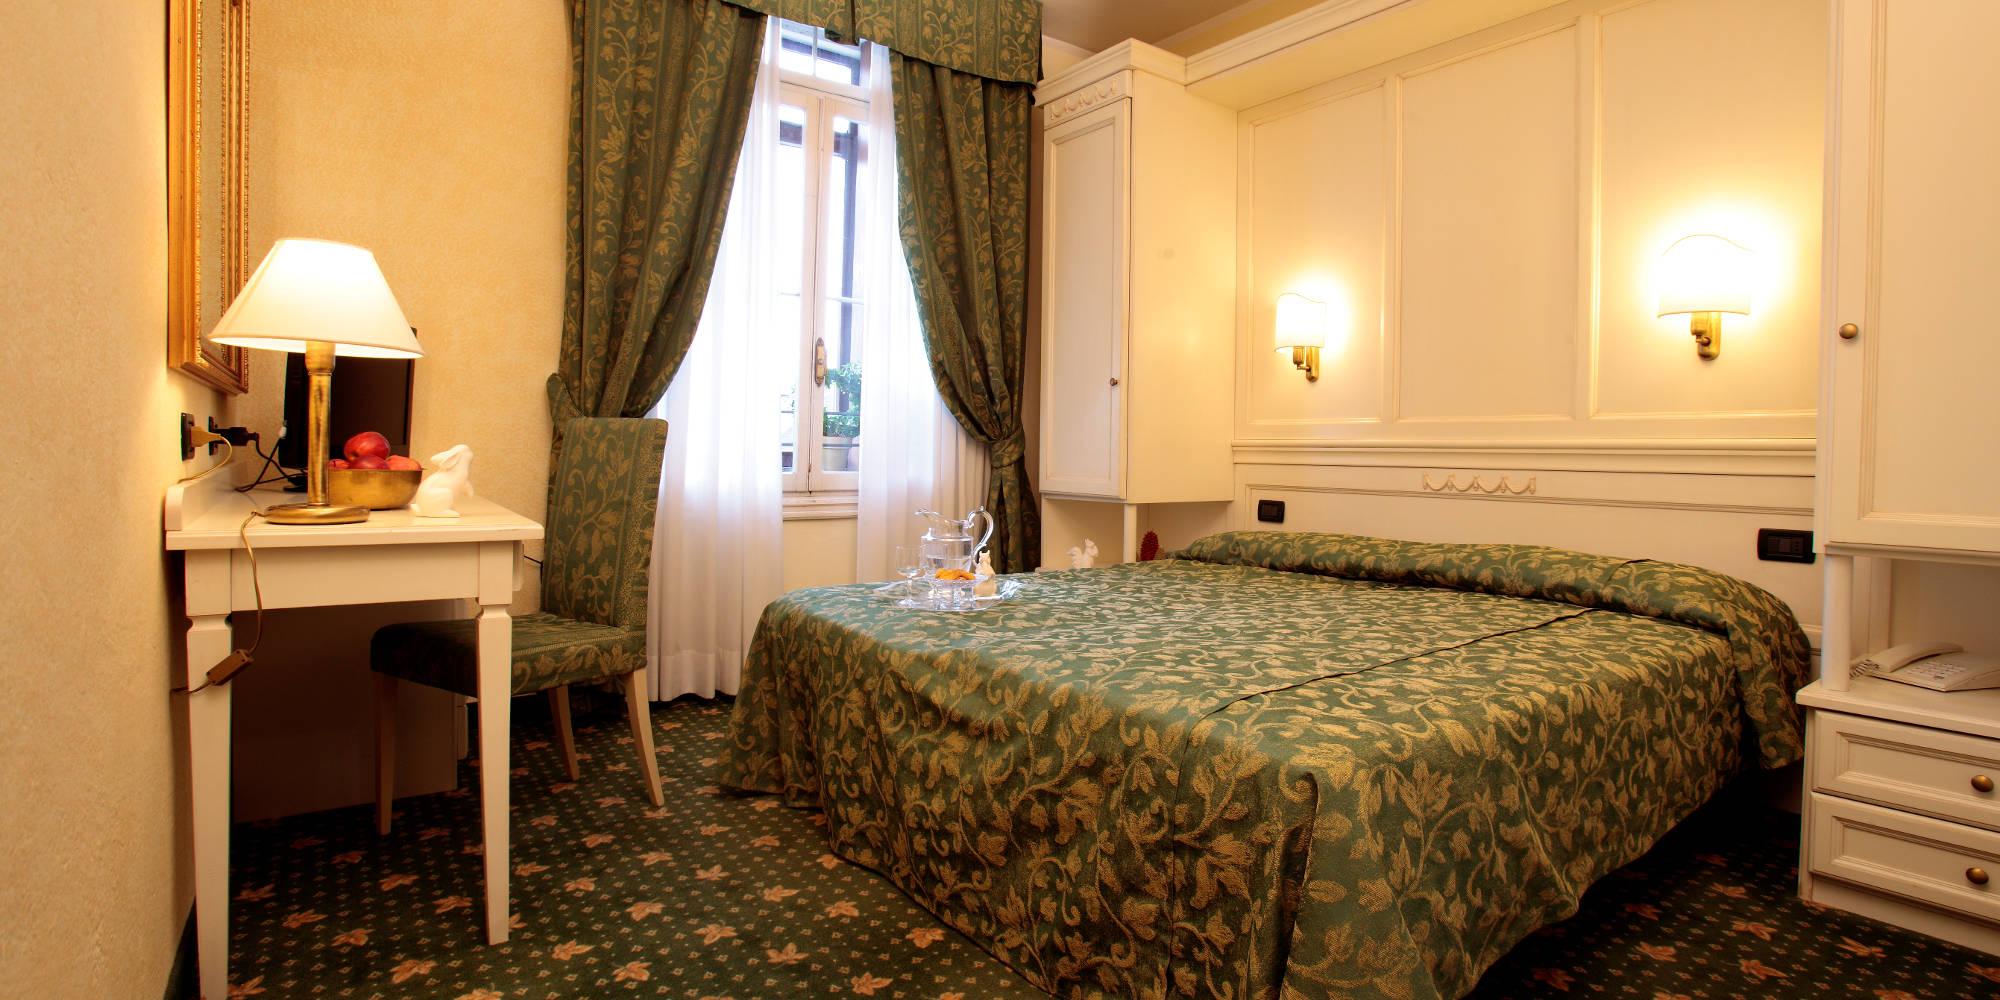 Camera Da Letto Bianca Offerta : Camera da letto matrimoniale croce bianca asiagoneve